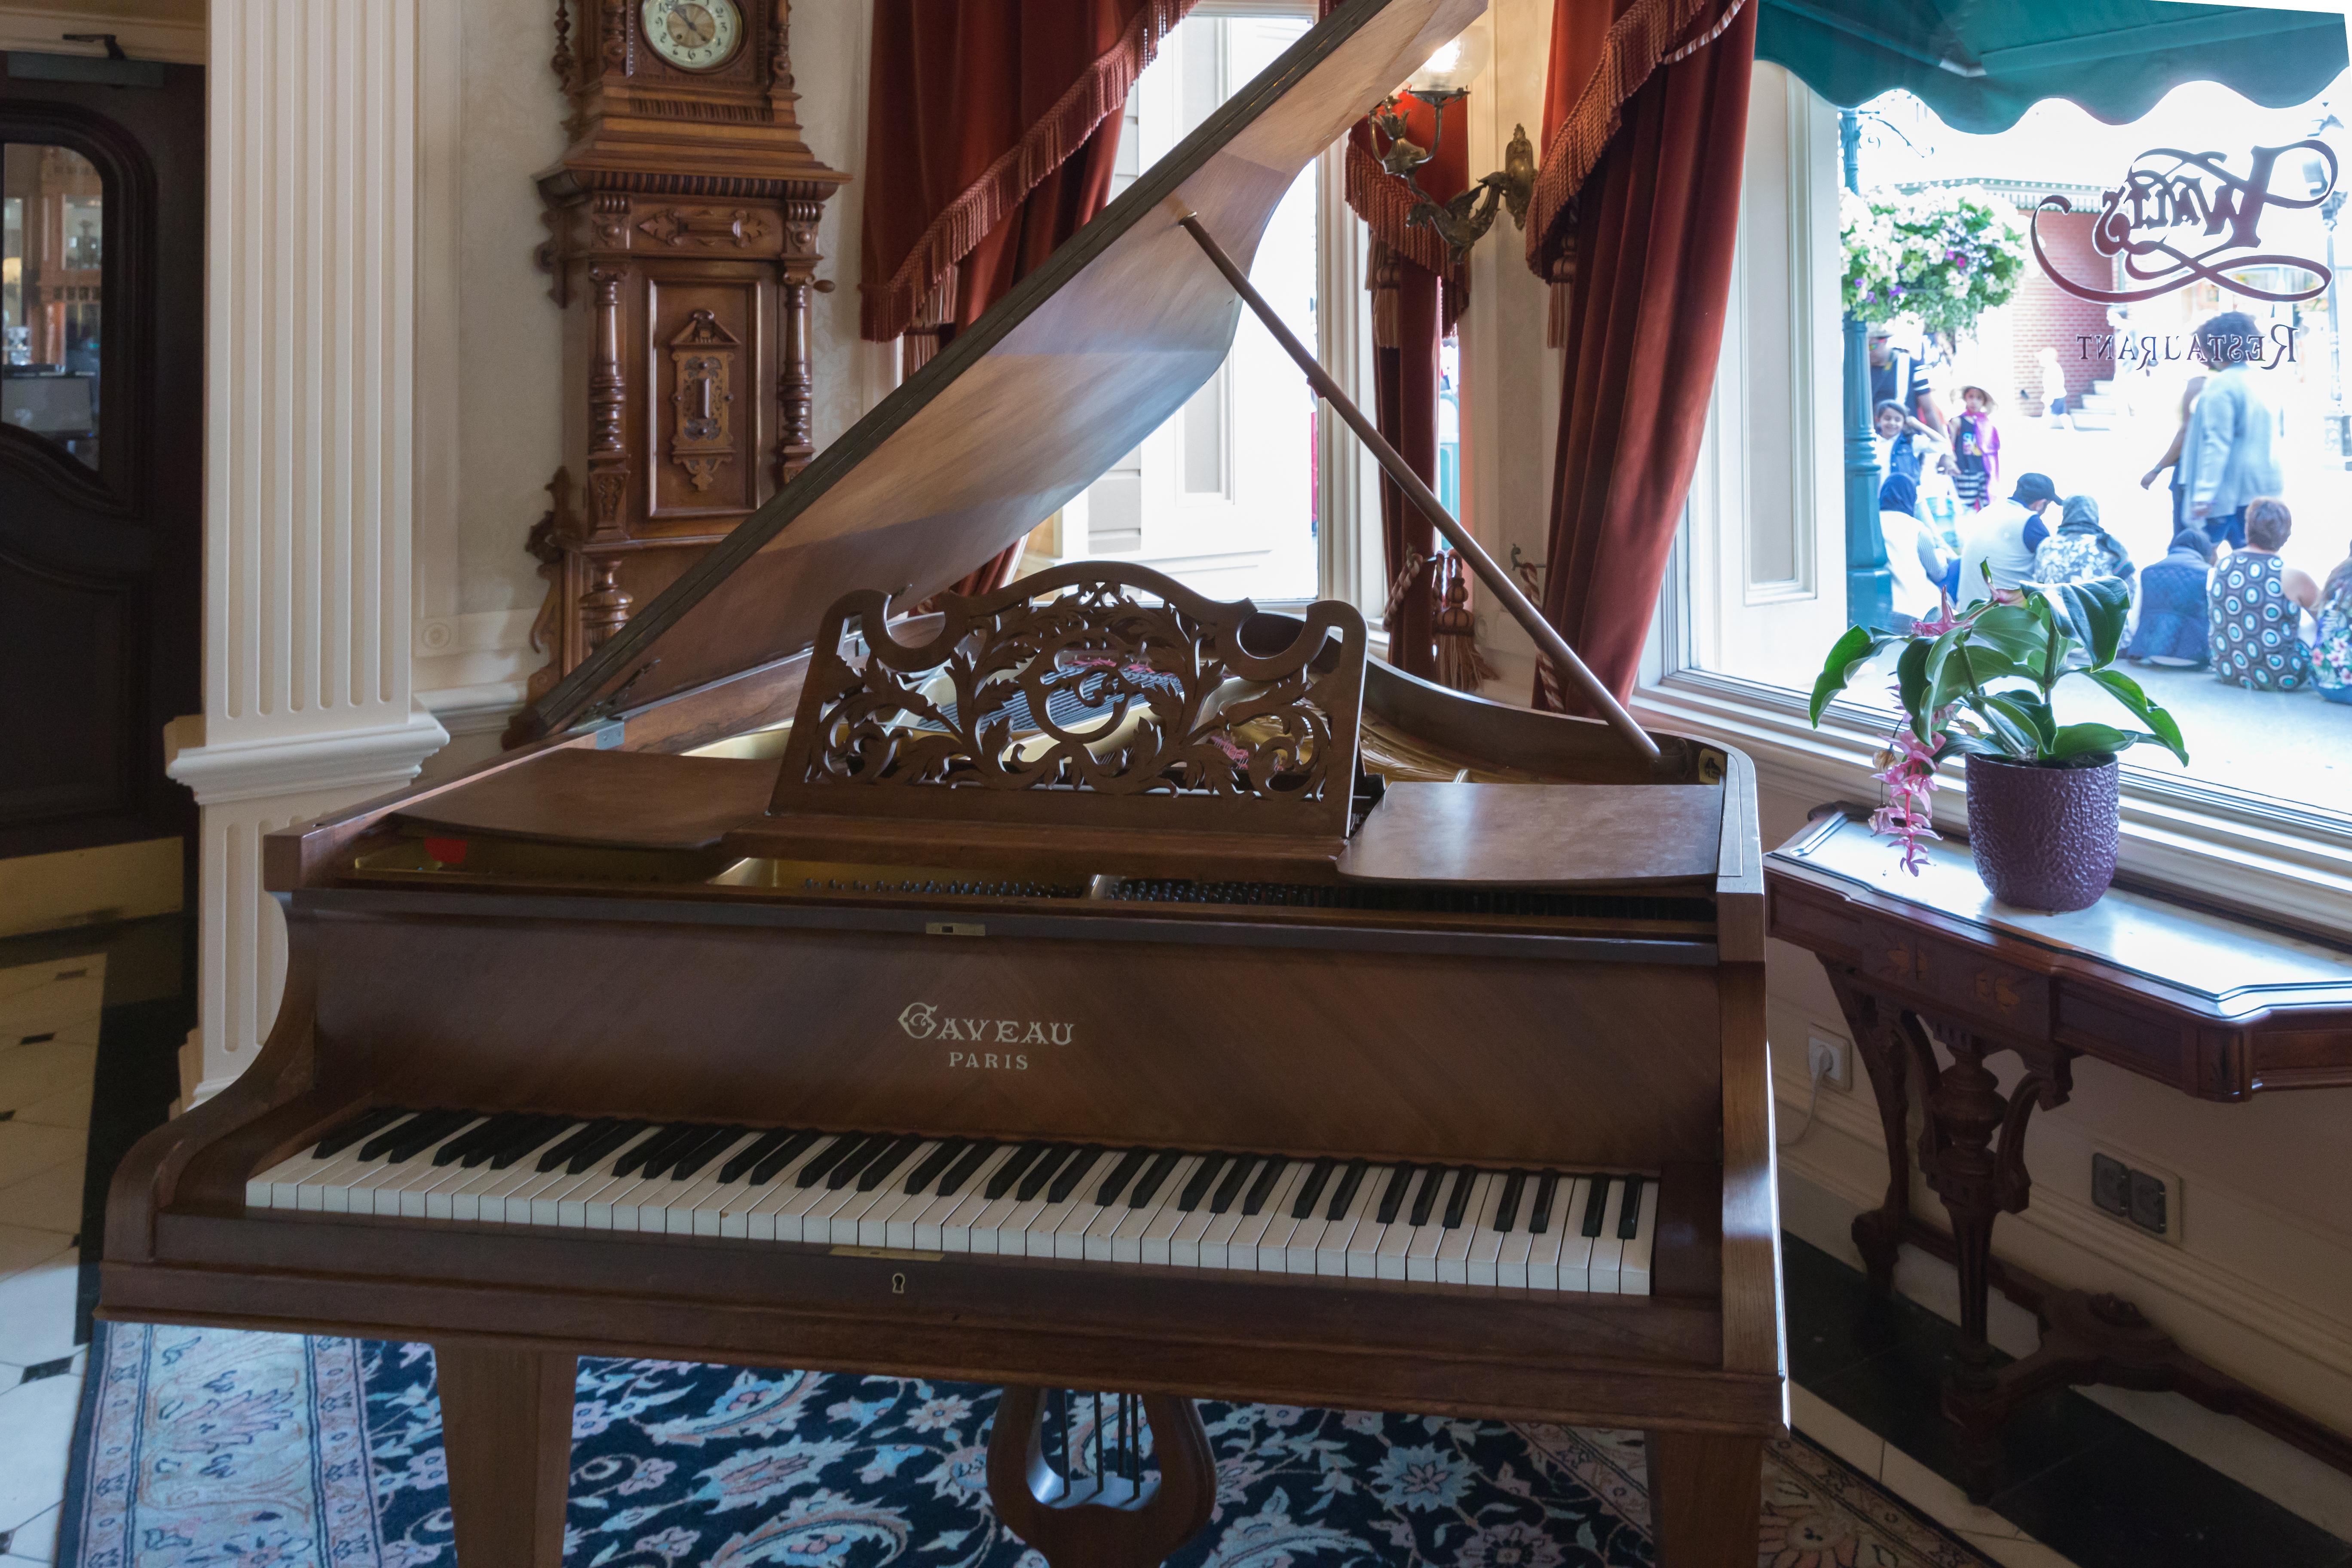 File:Piano à Queue   20150804 14h53 (10900)